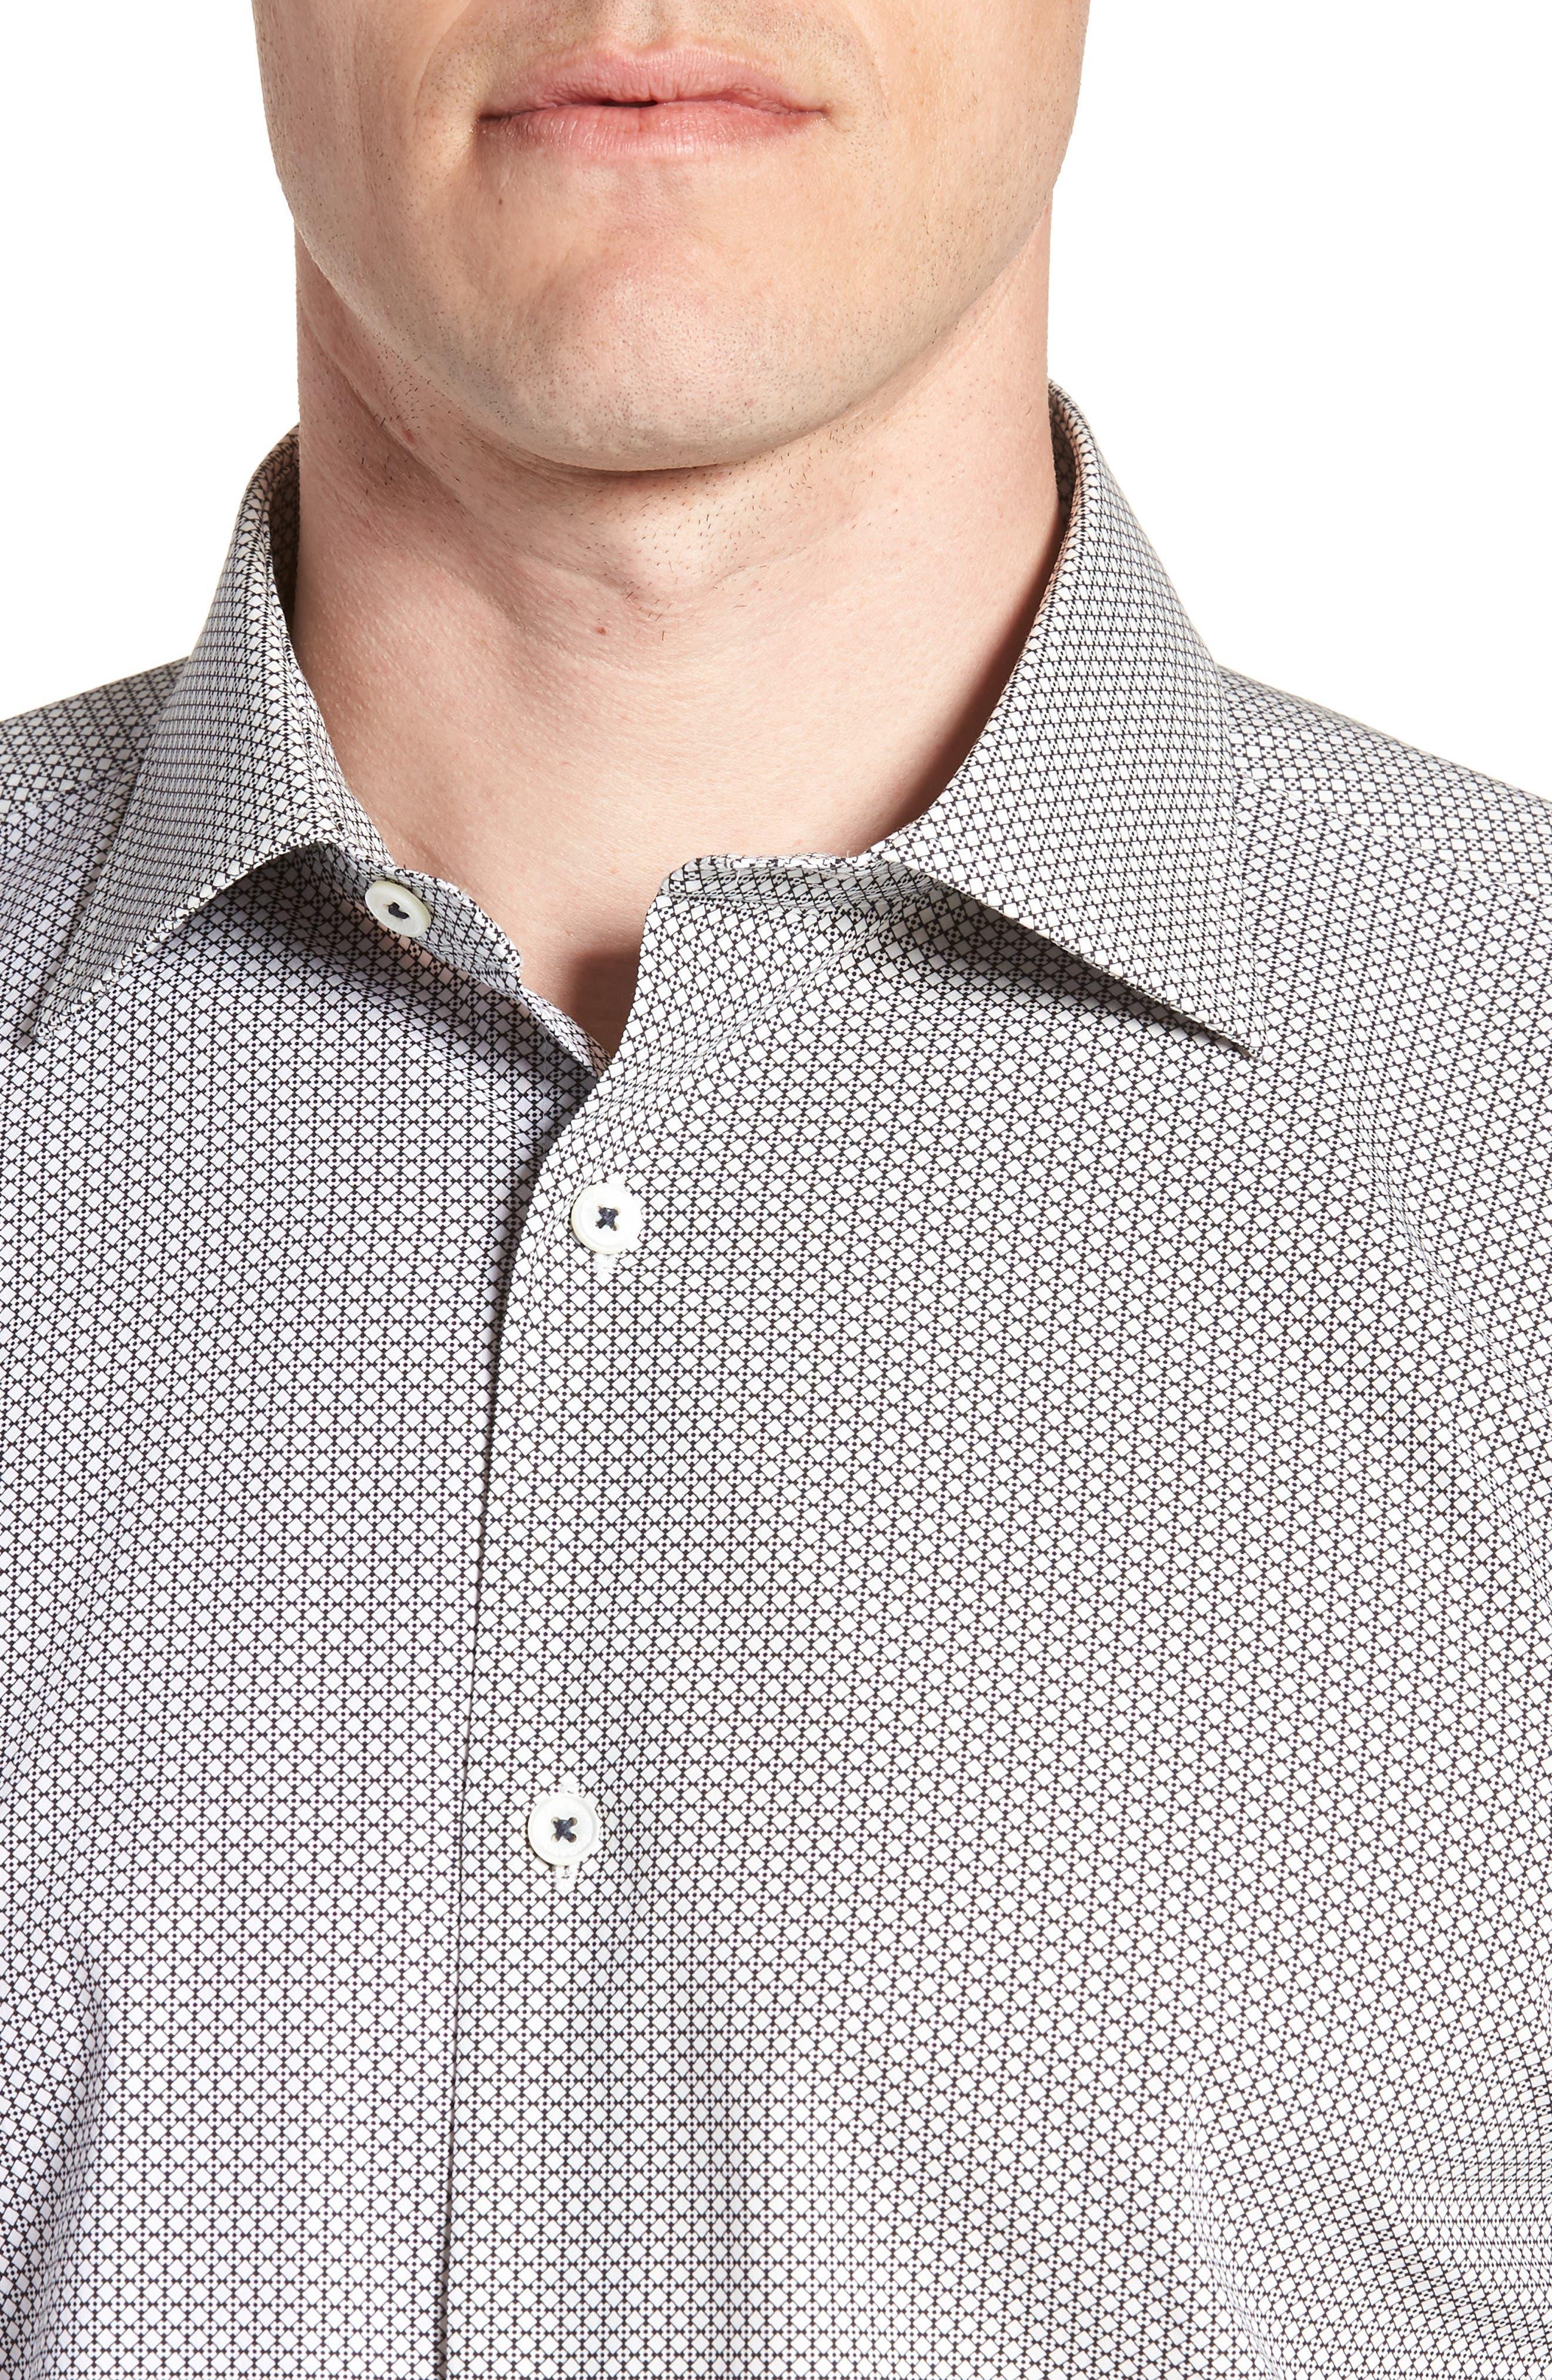 Trim Fit Print Dress Shirt,                             Alternate thumbnail 2, color,